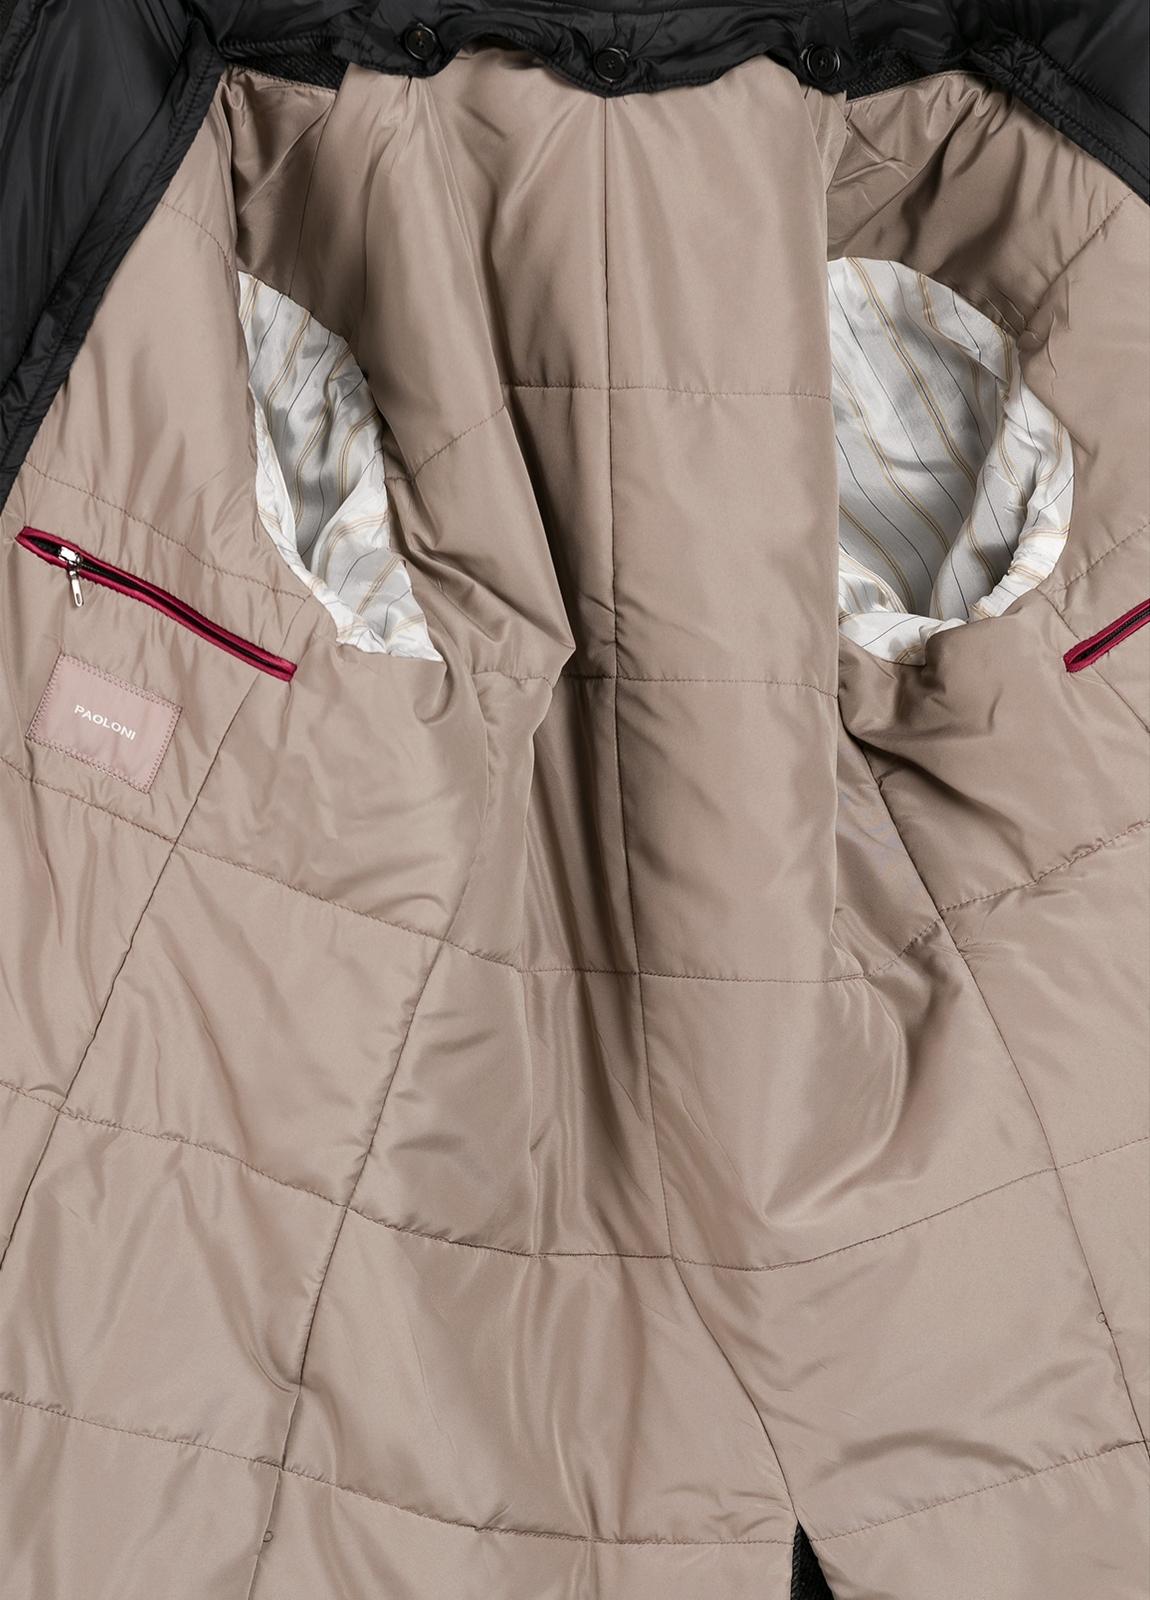 Abrigo tres botones color gris con pecherín interior. 65% Lana 30% Poliamida 5% fibras. - Ítem1